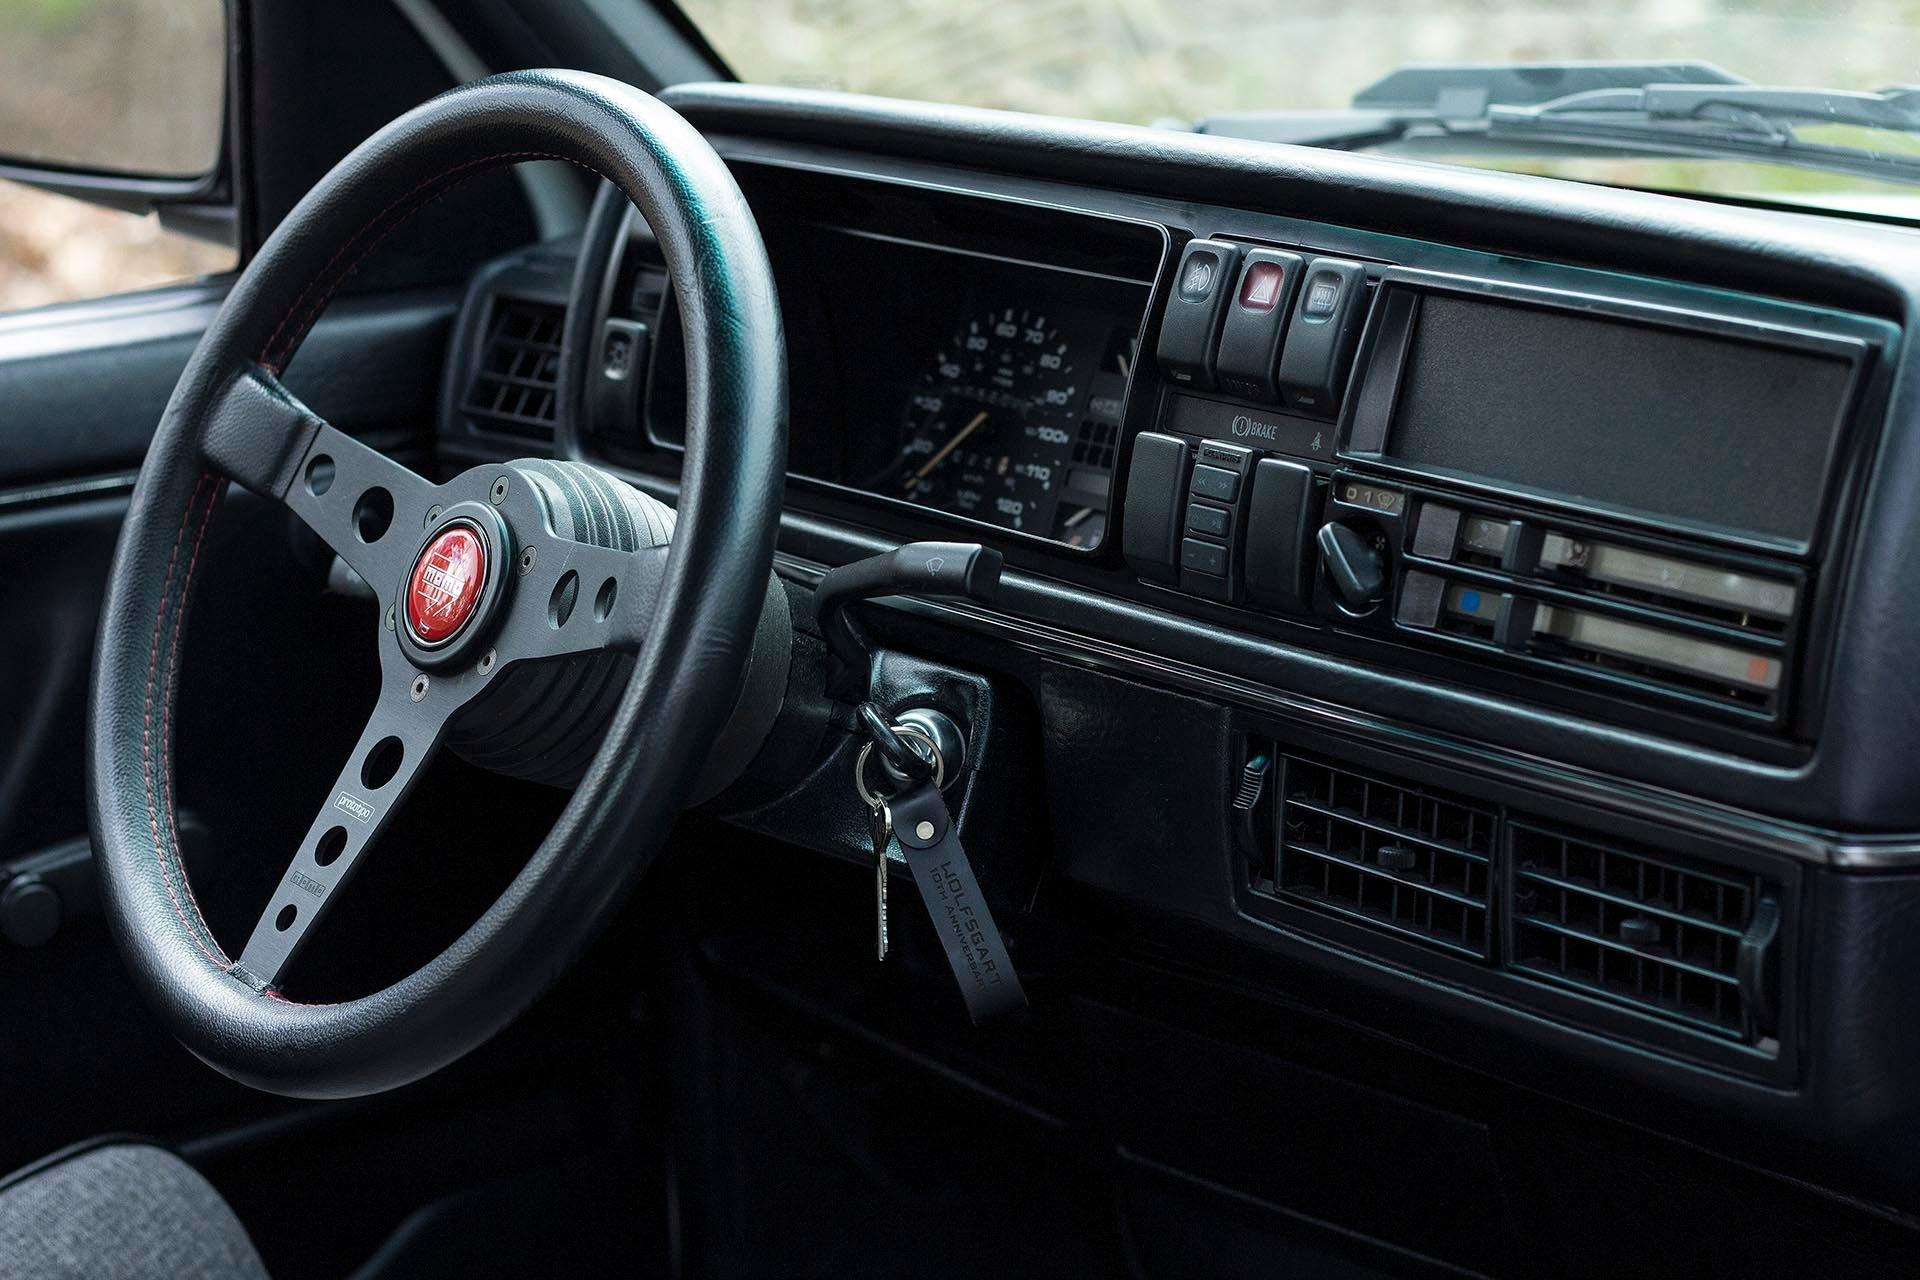 VW Mk2 dashboard Momo Prototipo